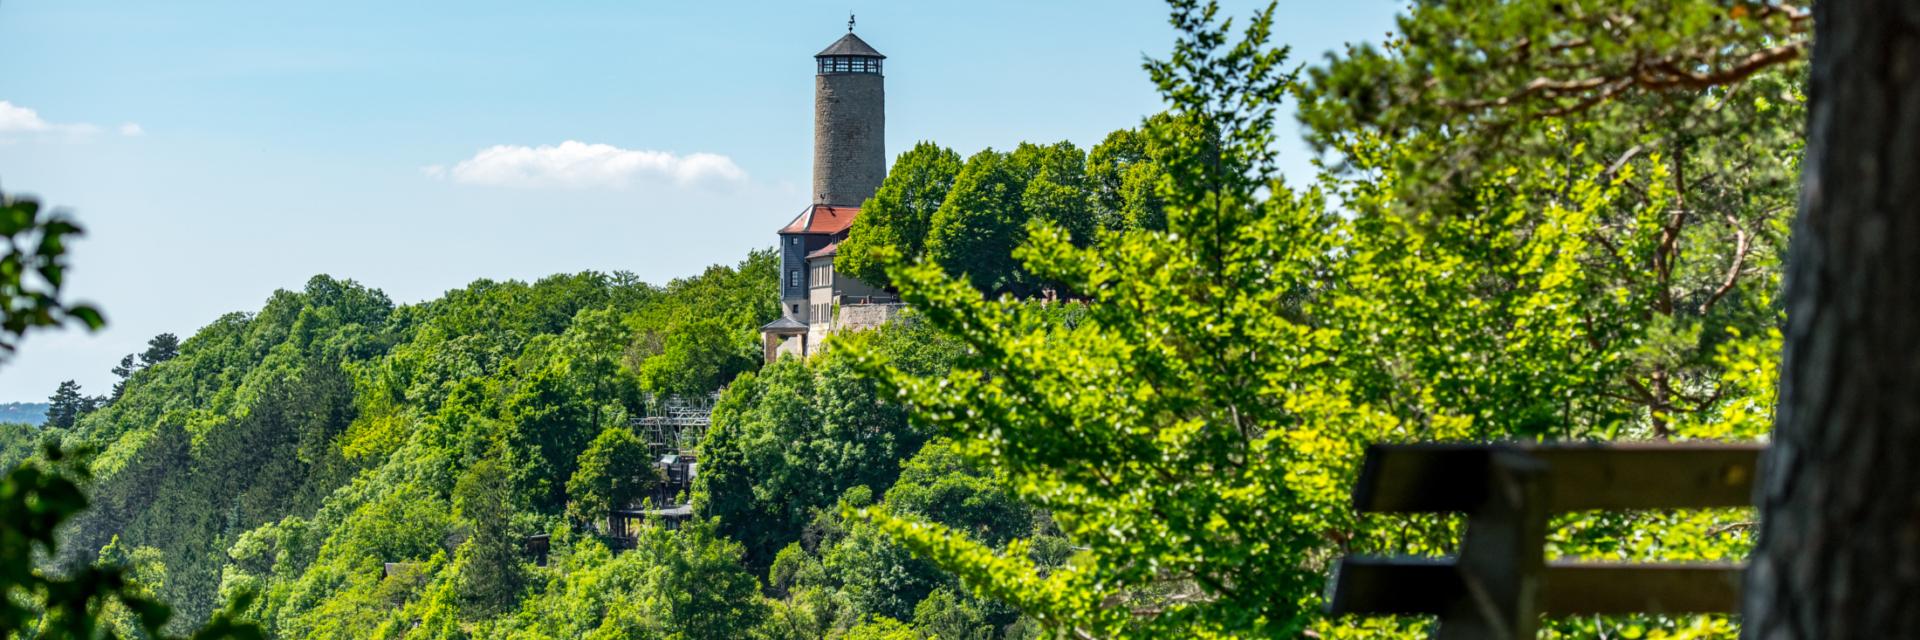 Fuchsturm Jena - Eins der Sieben Wunder Jenas © JenaKultur, Foto: Christian Häcker